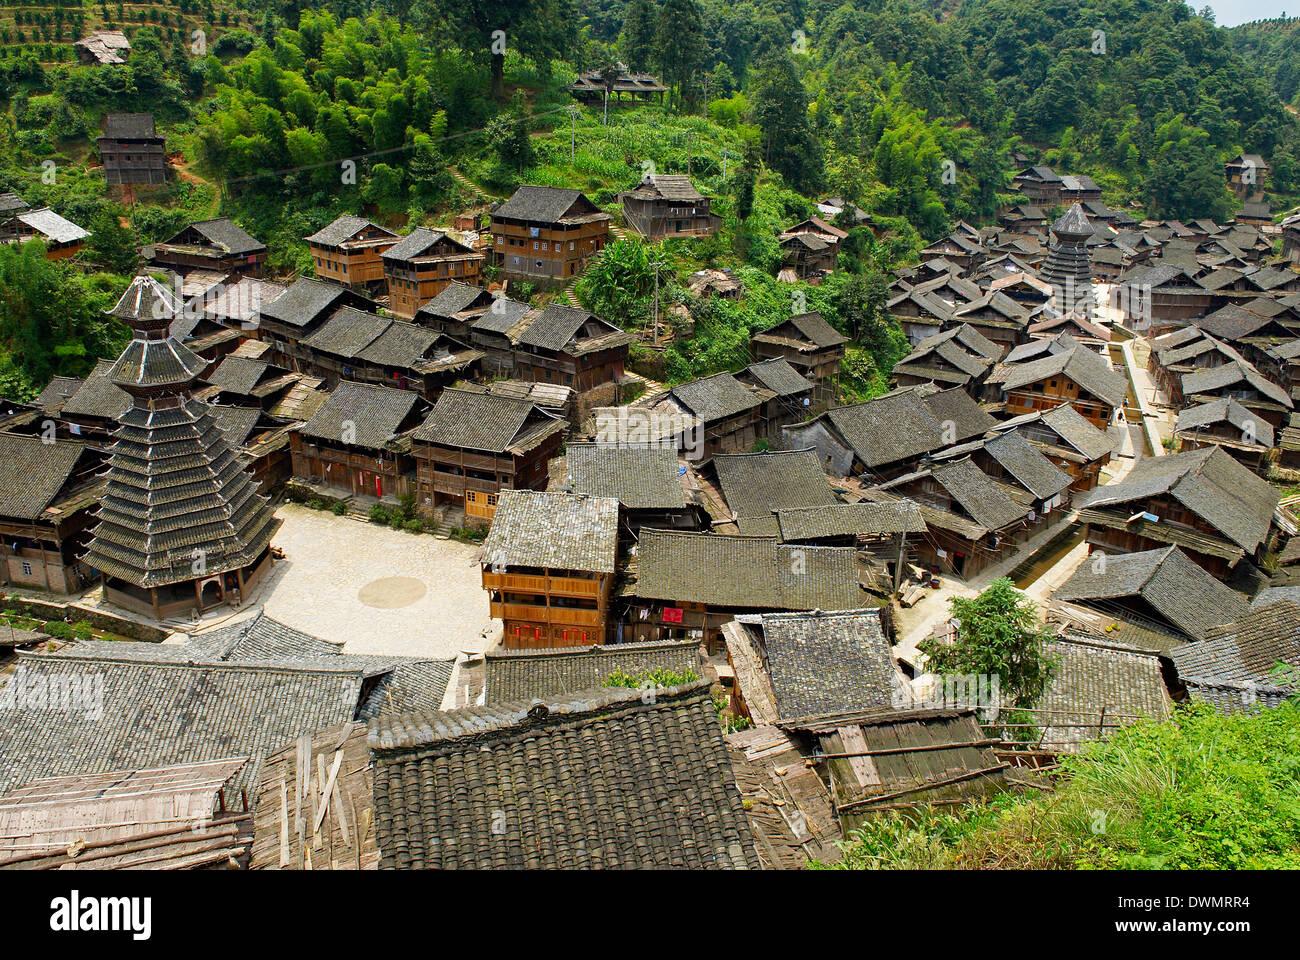 Drum Tower at Rongjiang, Guizhou Province, China, Asia Stock Photo